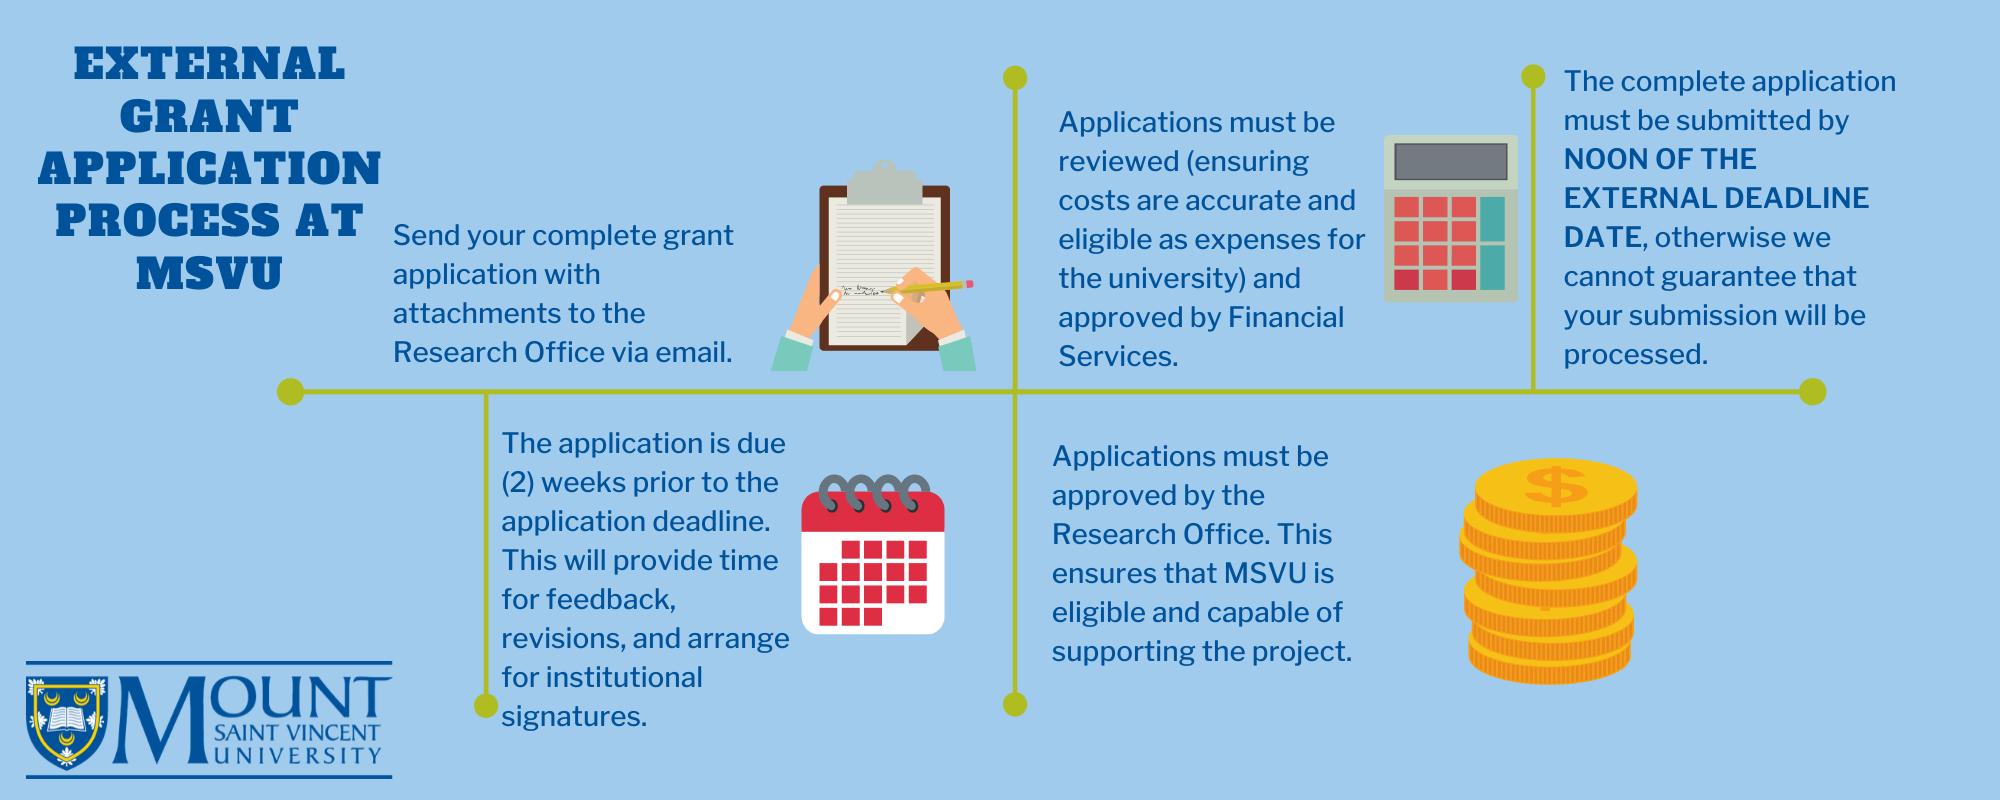 External Grant Application Process at MSVU Horizonal